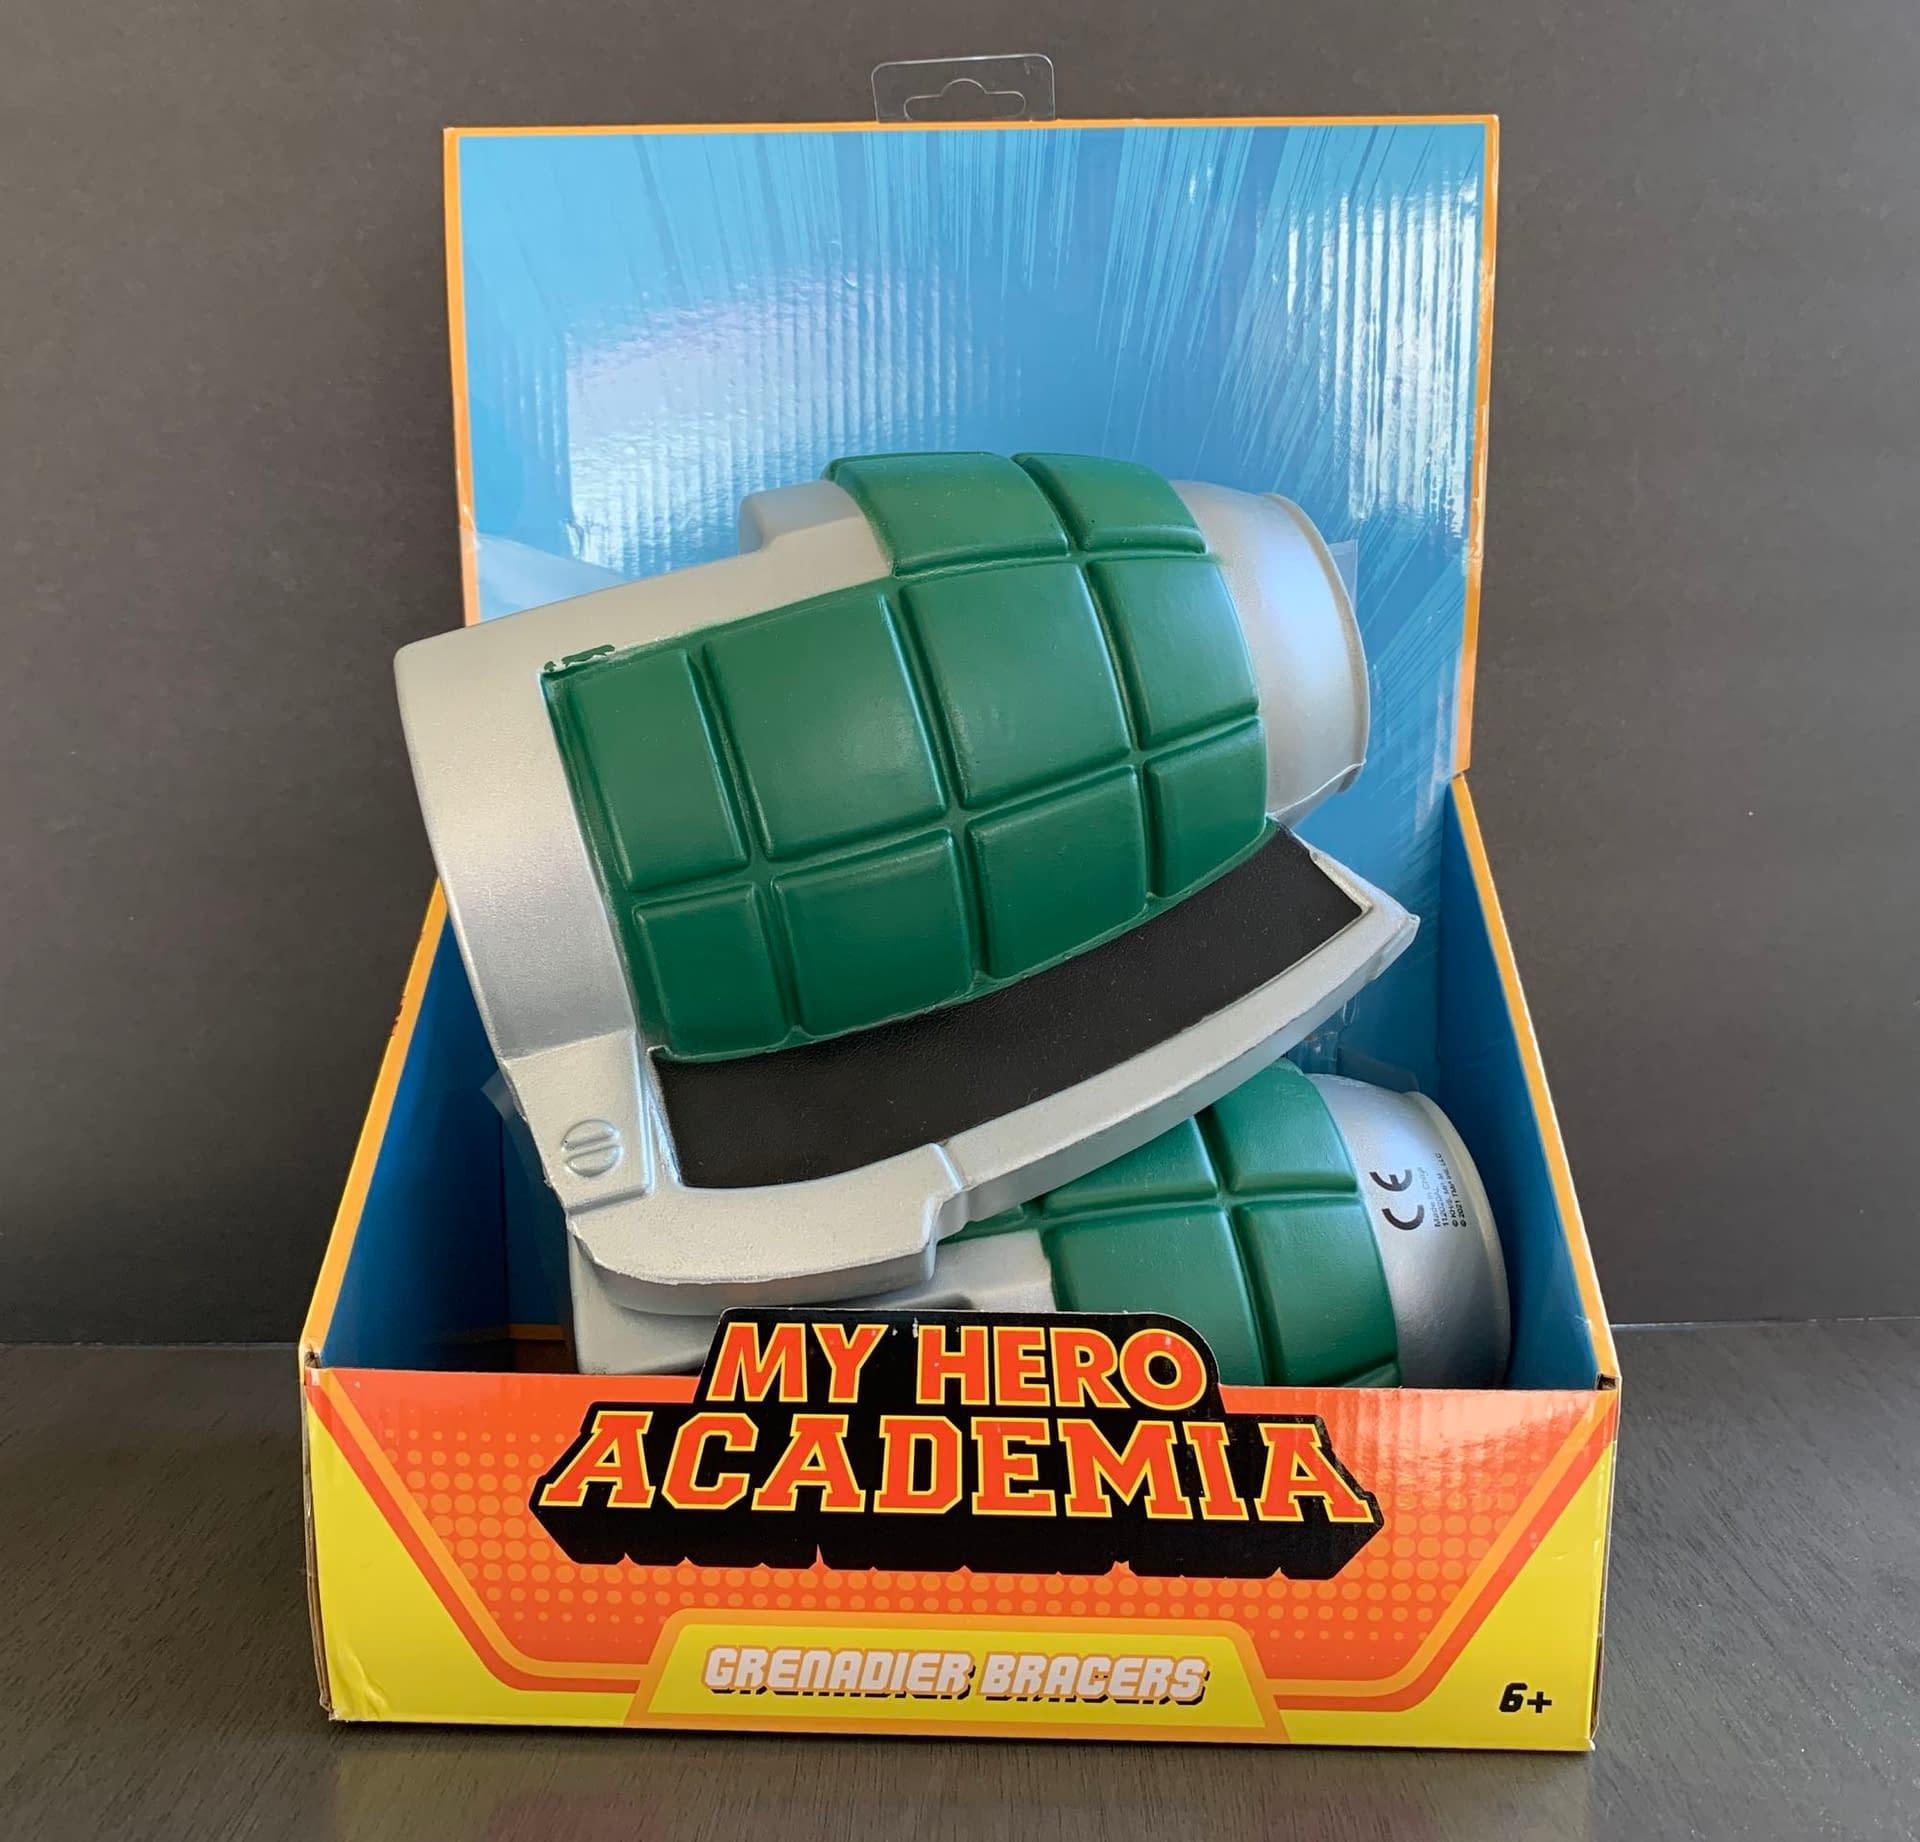 My Hero Academia Bakugo Gauntlets Are Perfect For Kiddos